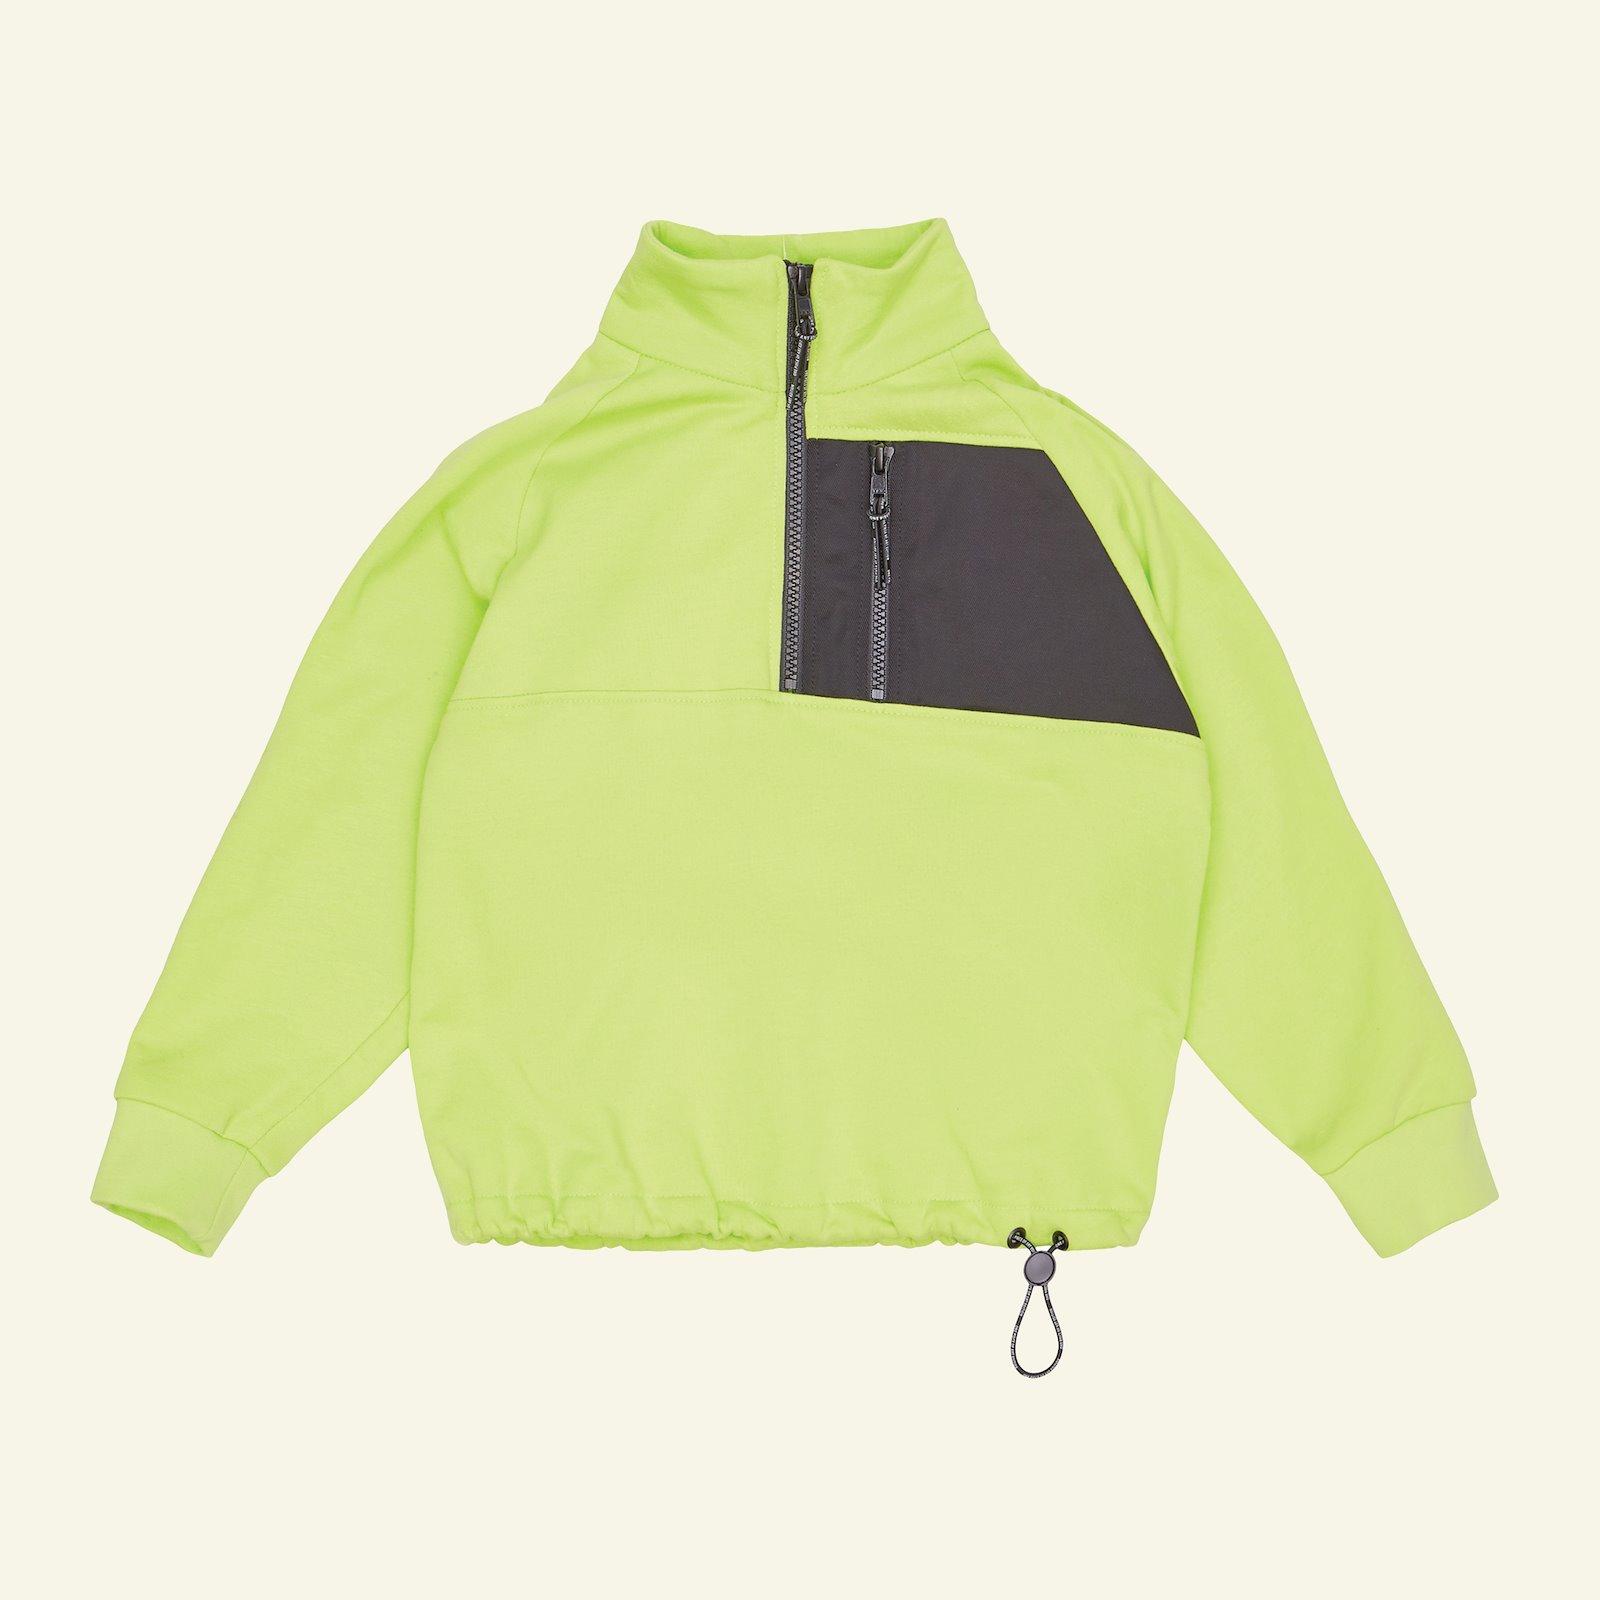 Anorak and jacket, 140/10y p64020_211770_230056_450012_sskit